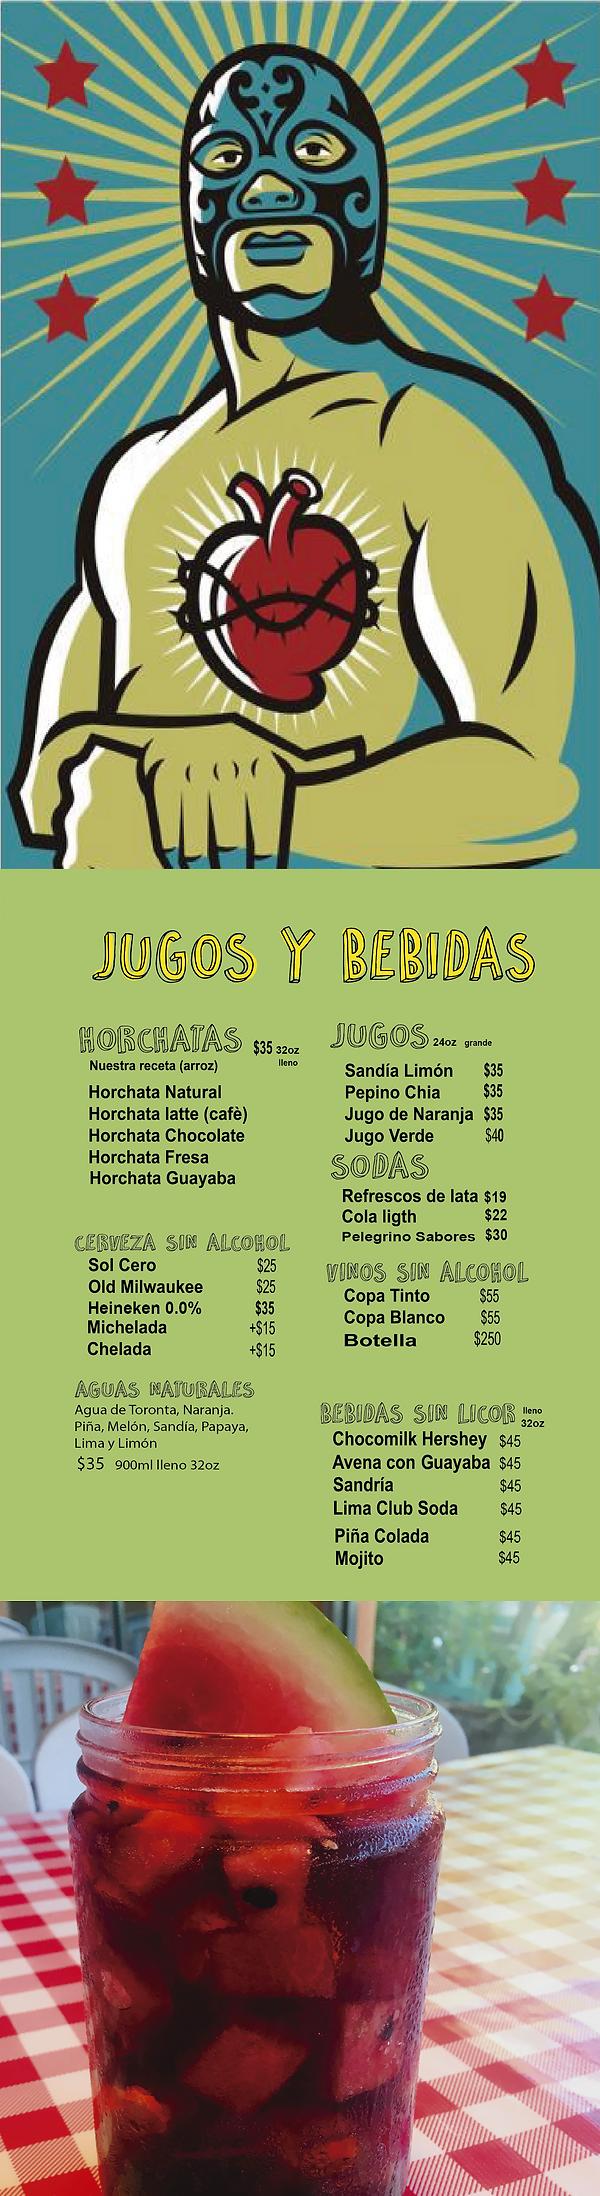 menu chchibas jygos marzo 2021-01.png